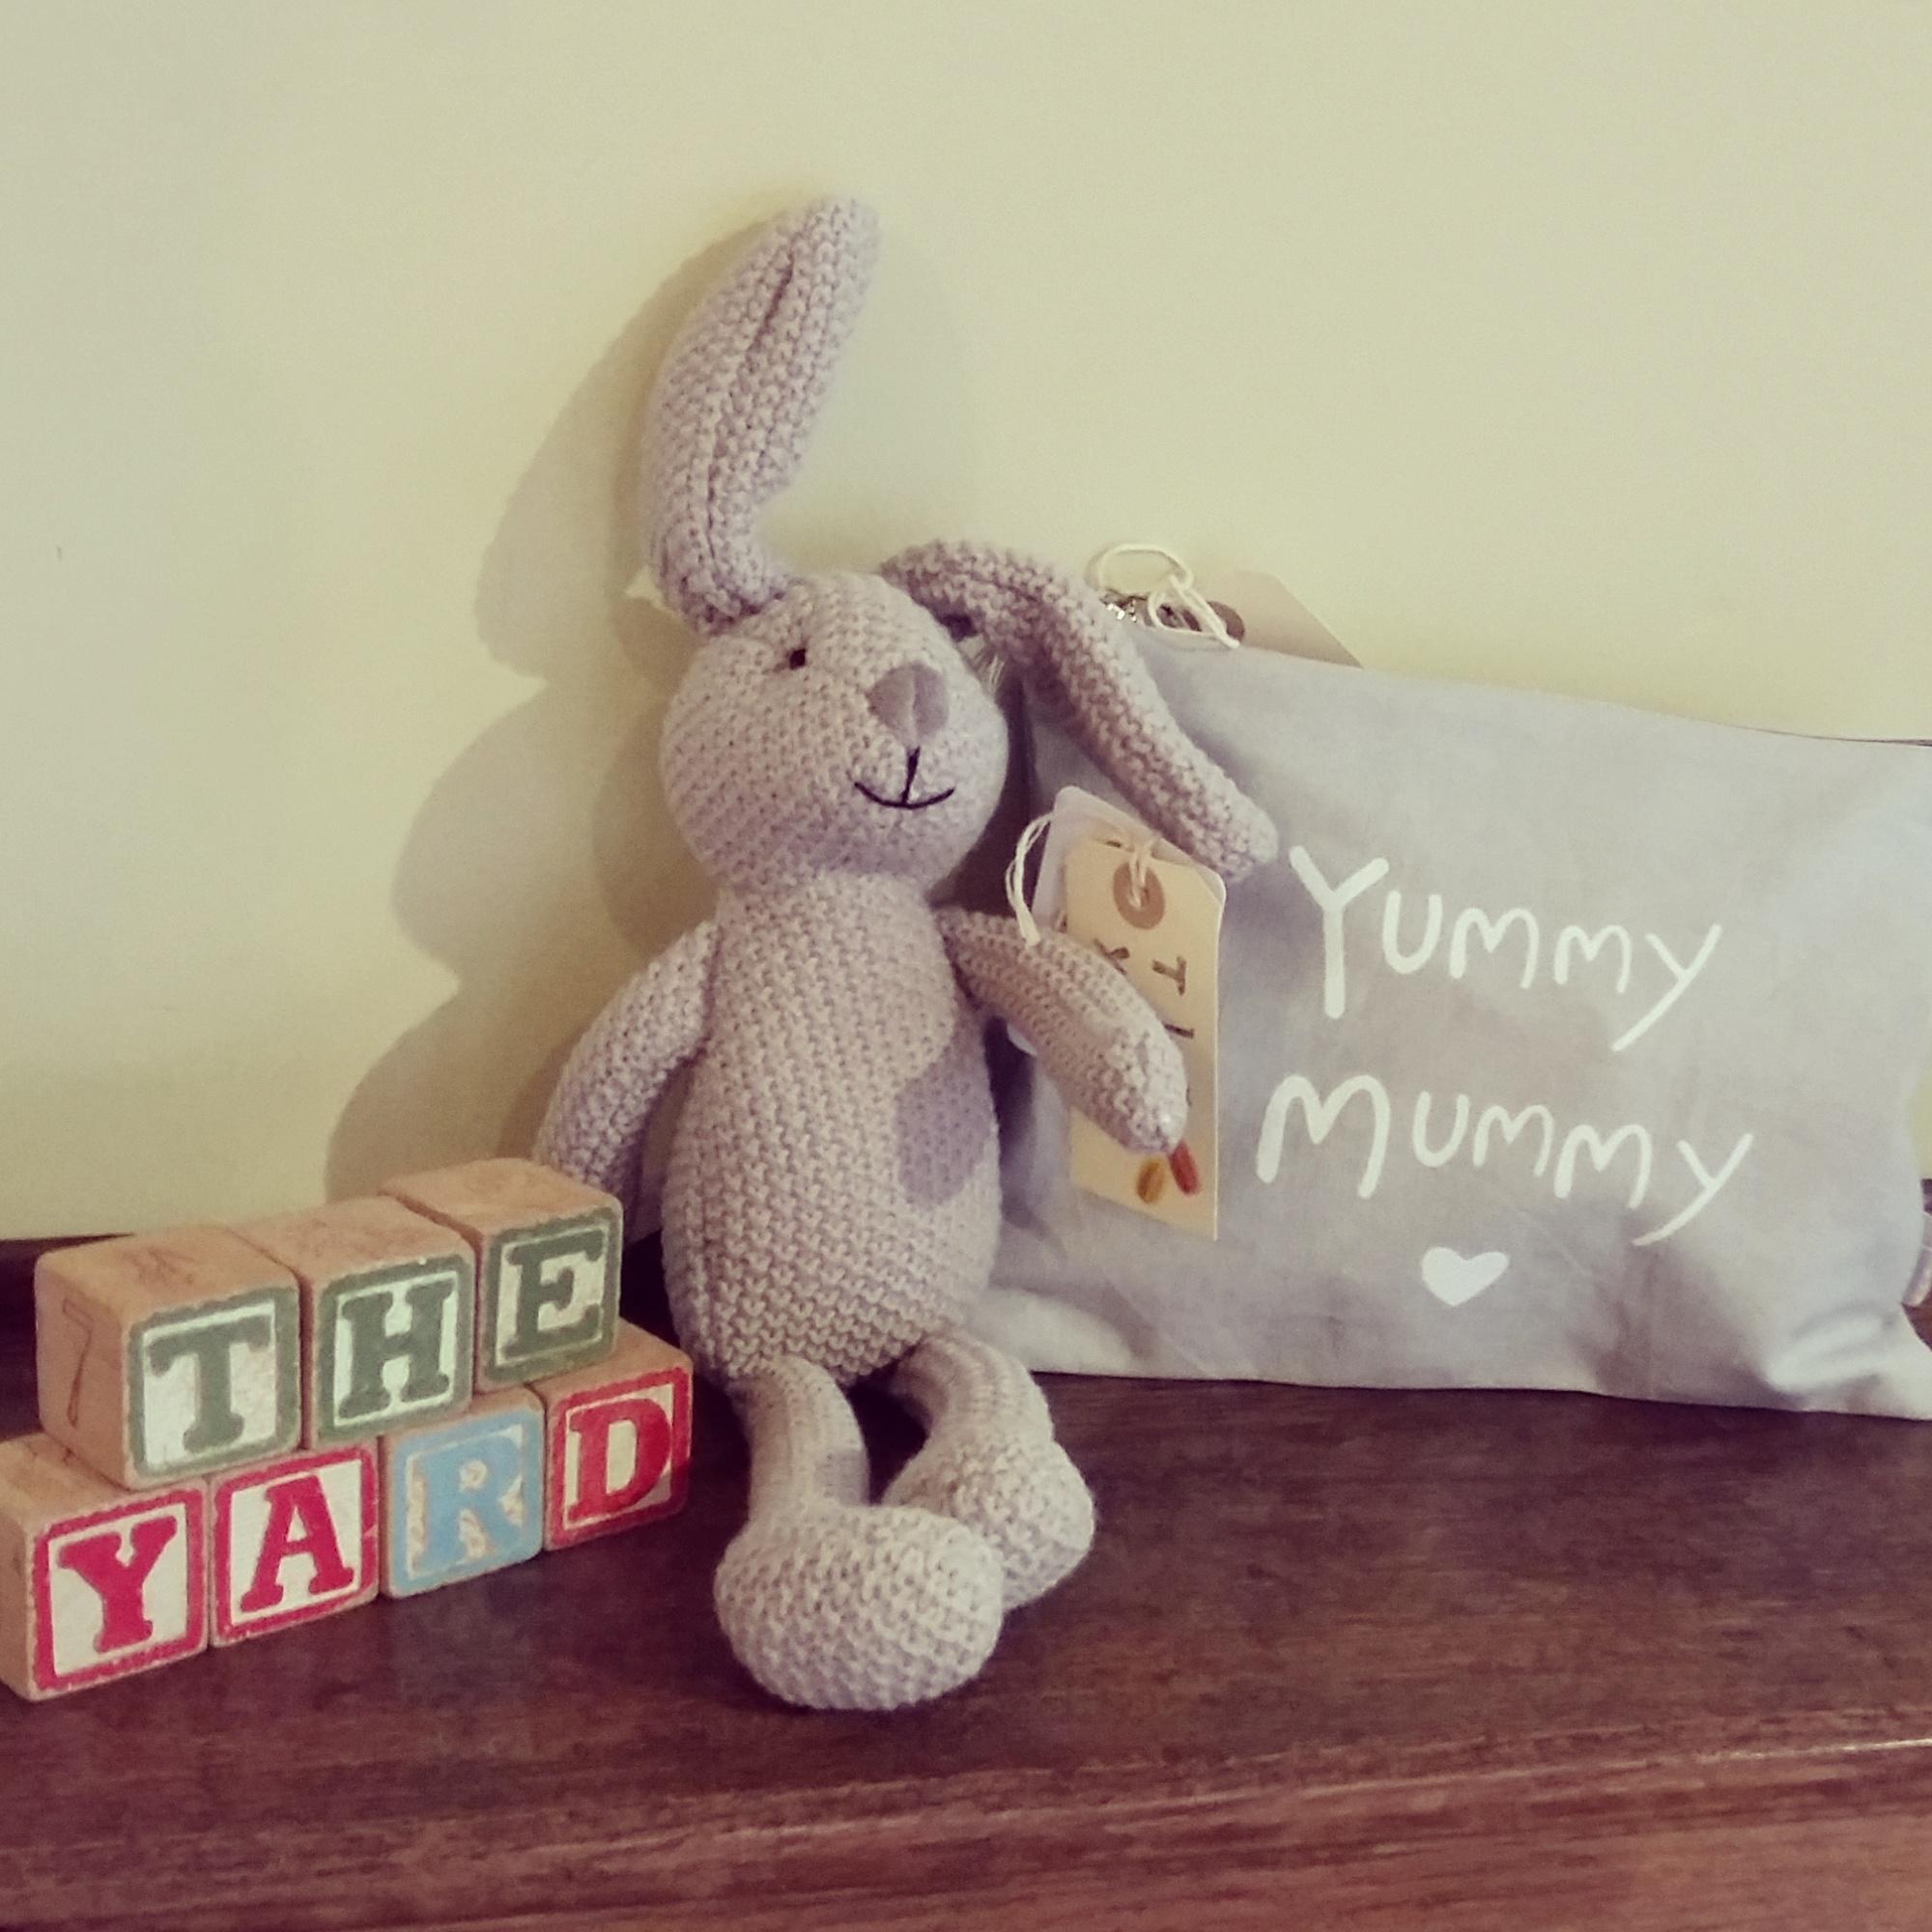 Yummy mummy small bag and soft grey knit bunny